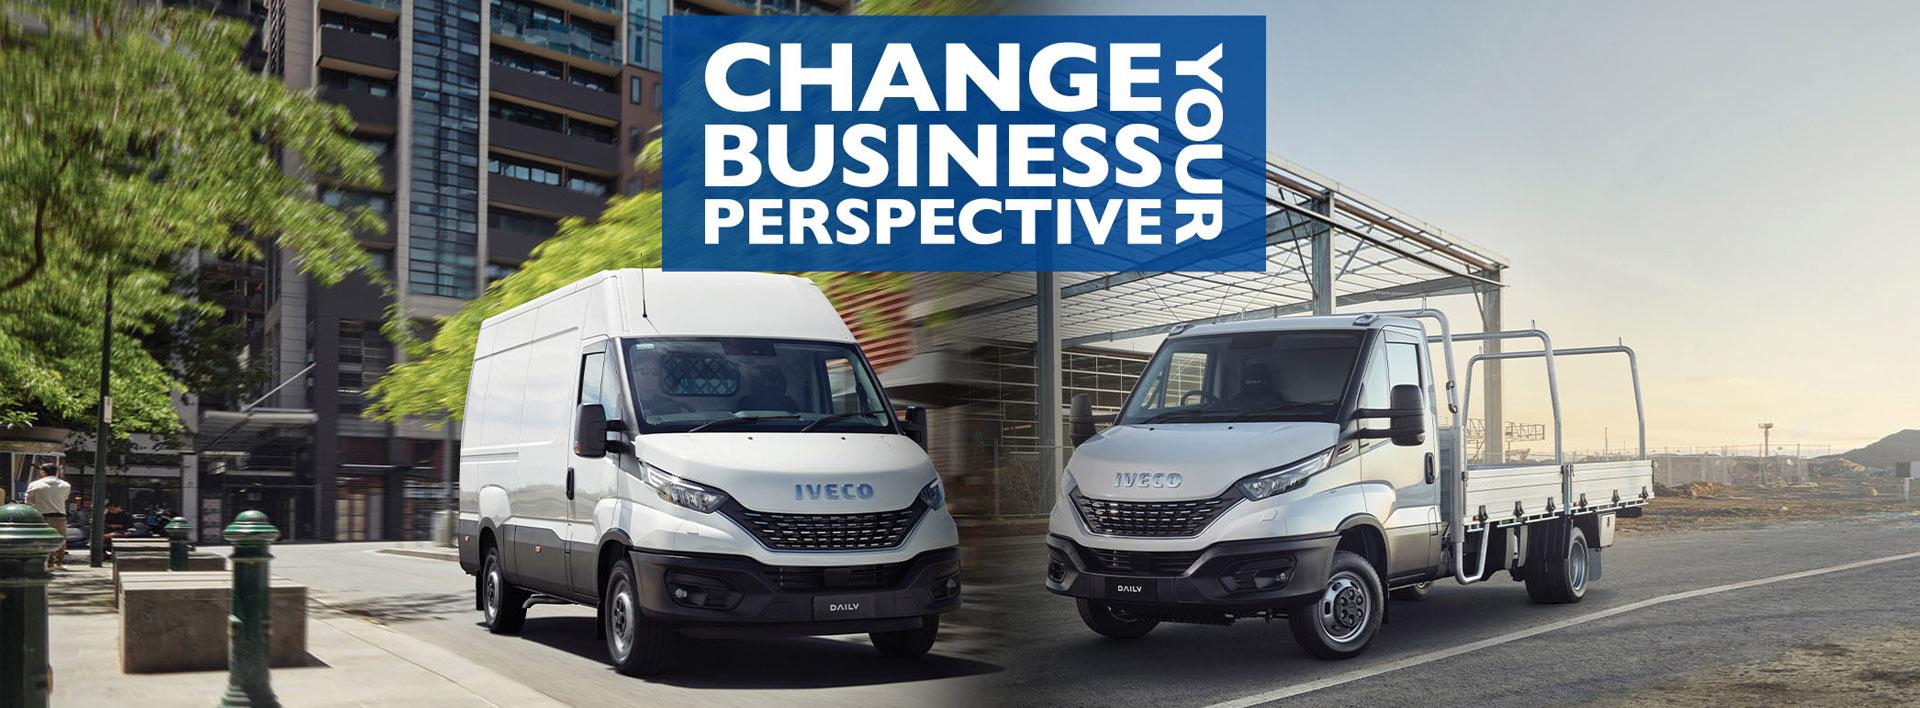 IVECO New Trucks & Buses Range